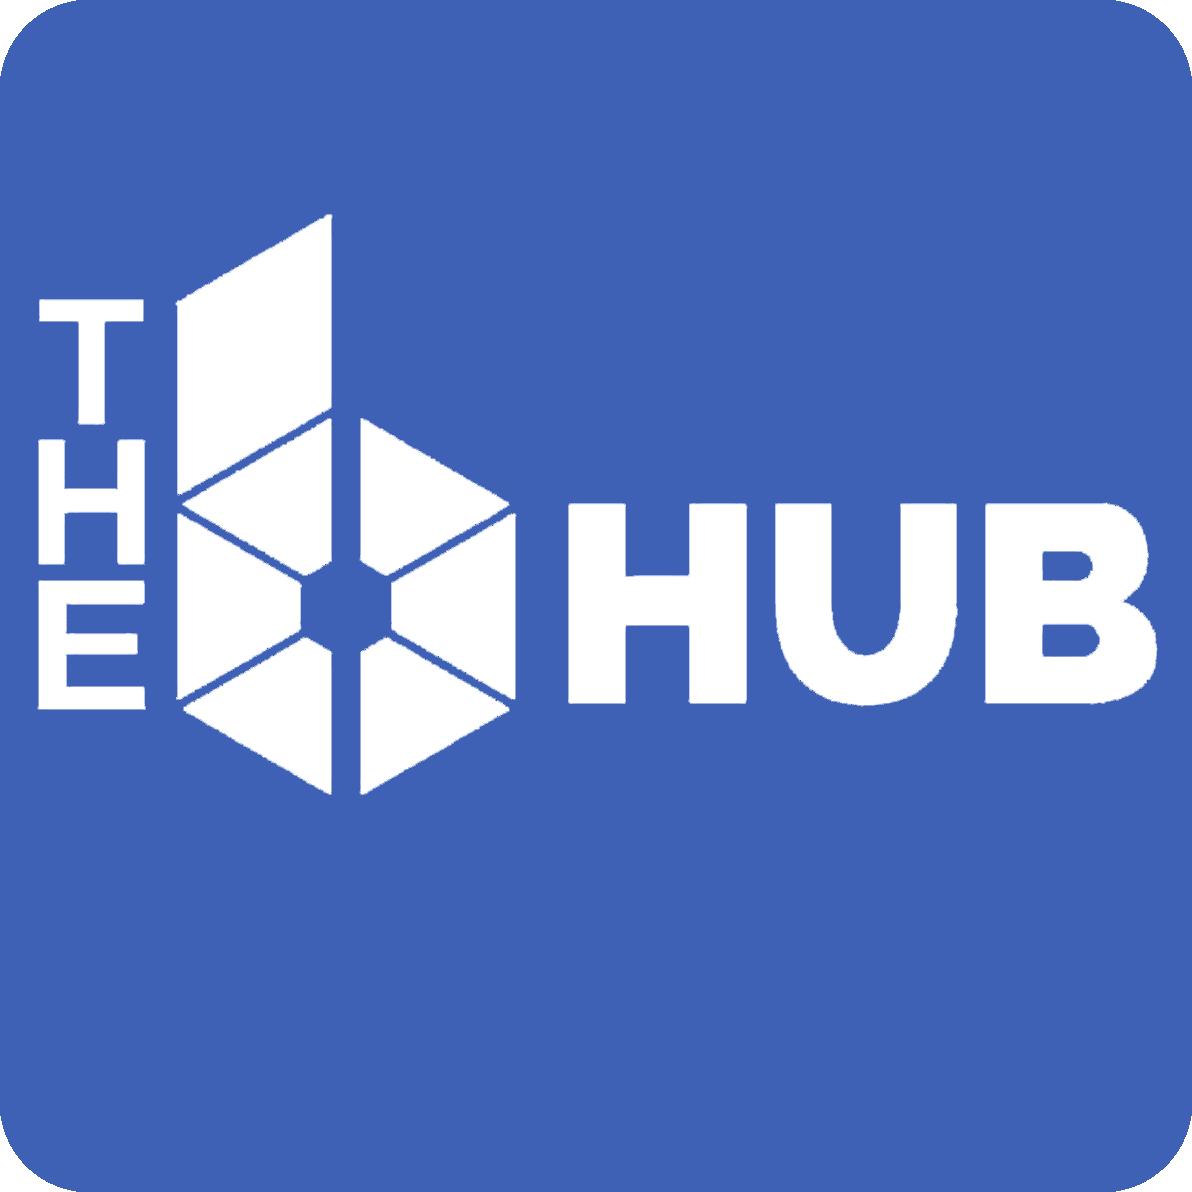 TheBhub Logo